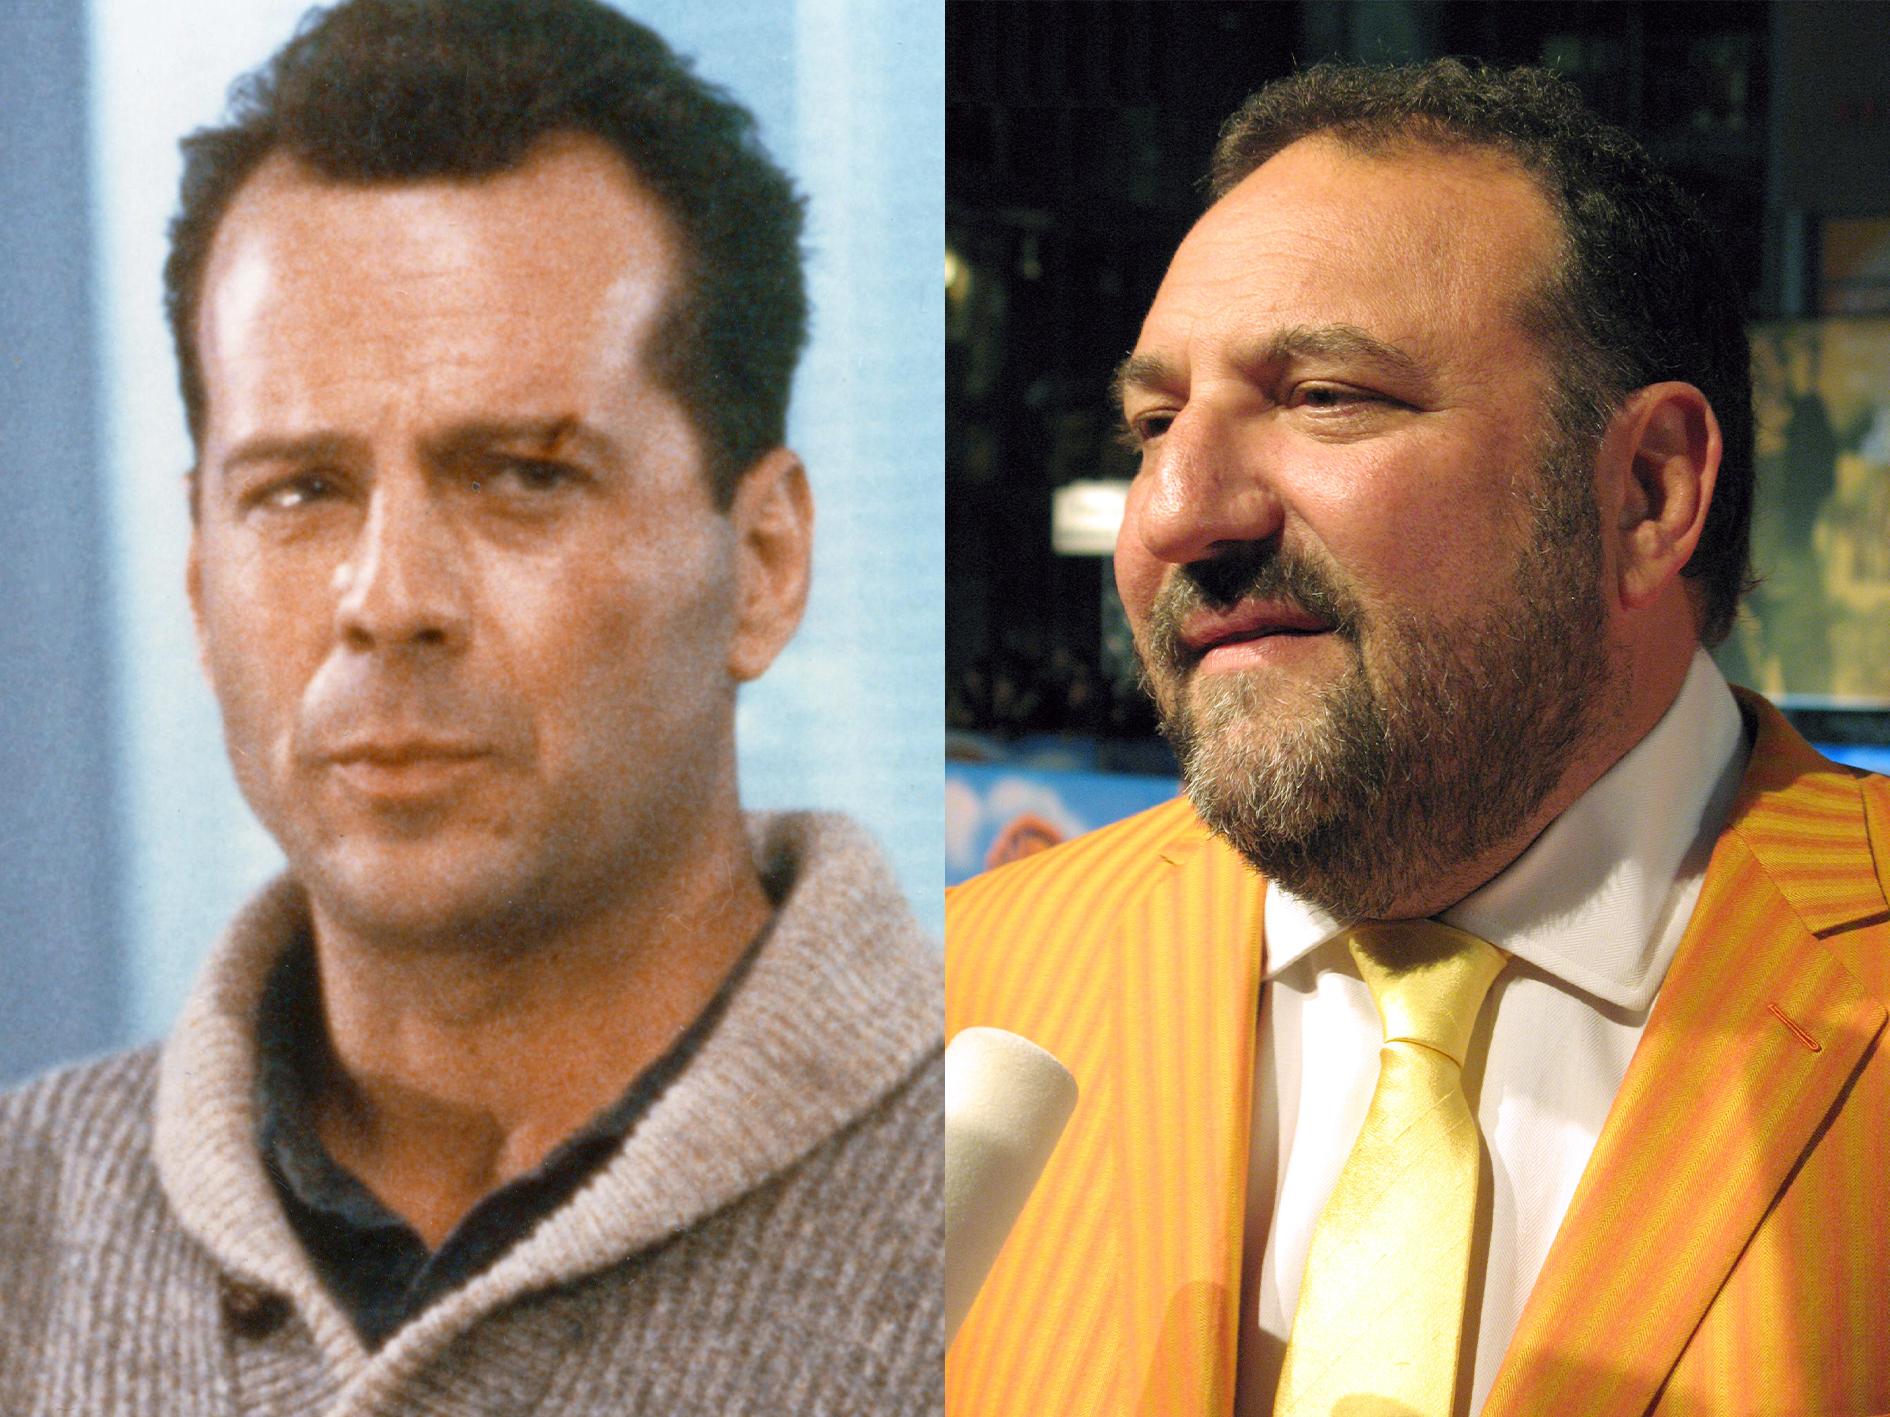 Die Hard 2 Bruce Willis Joel Silver 10 Explosive Facts You Never Knew About Die Hard 2: Die Harder